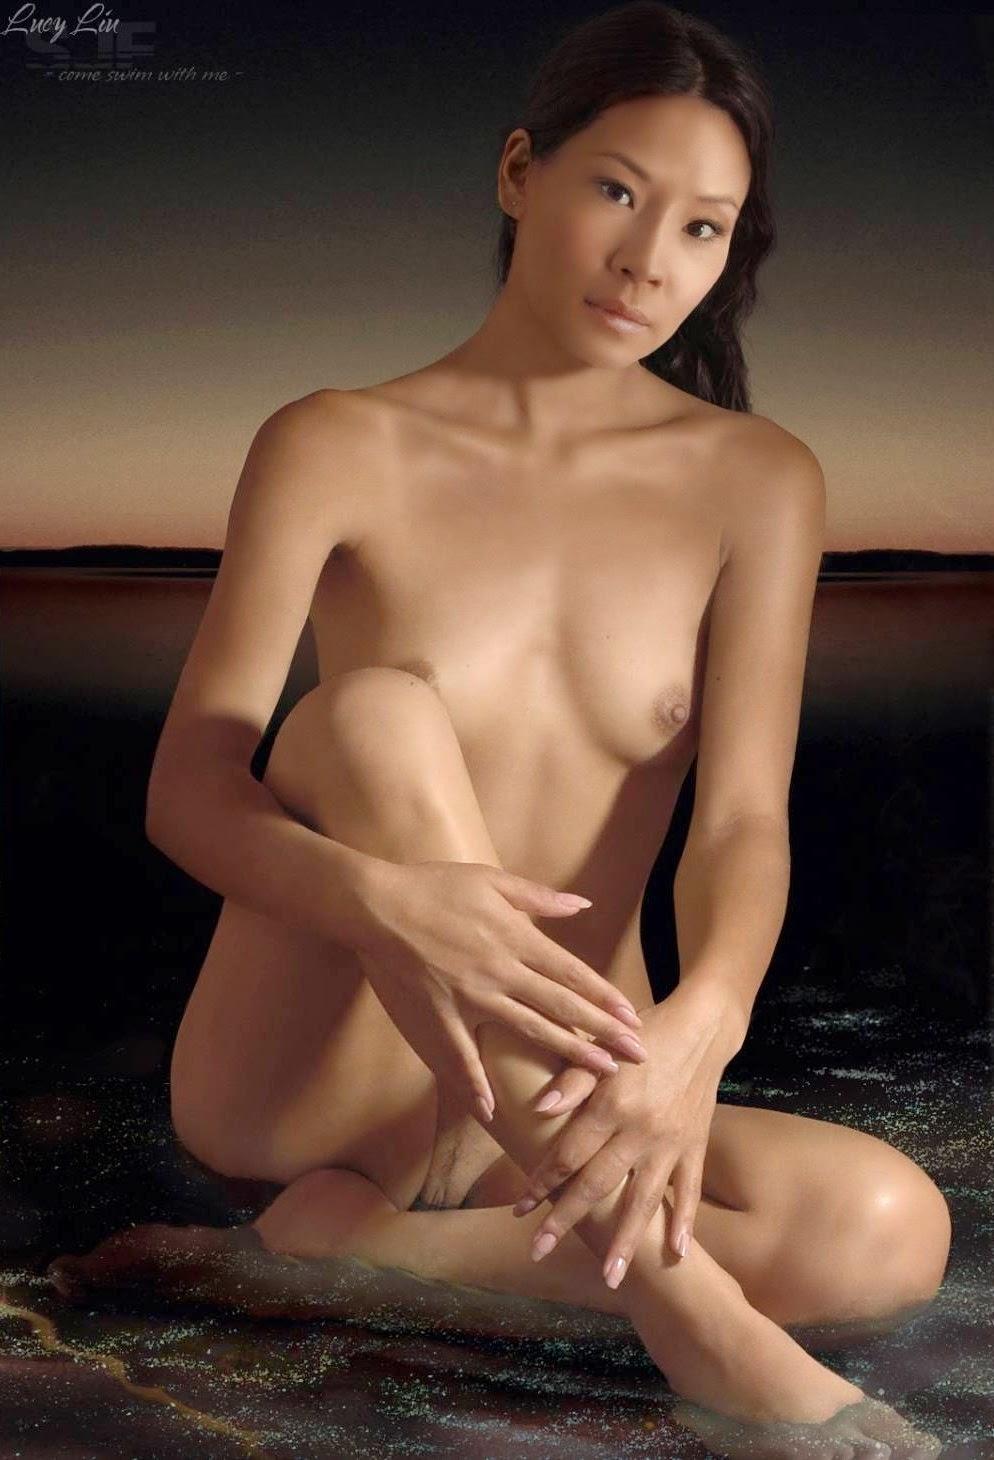 Nude celeb pics